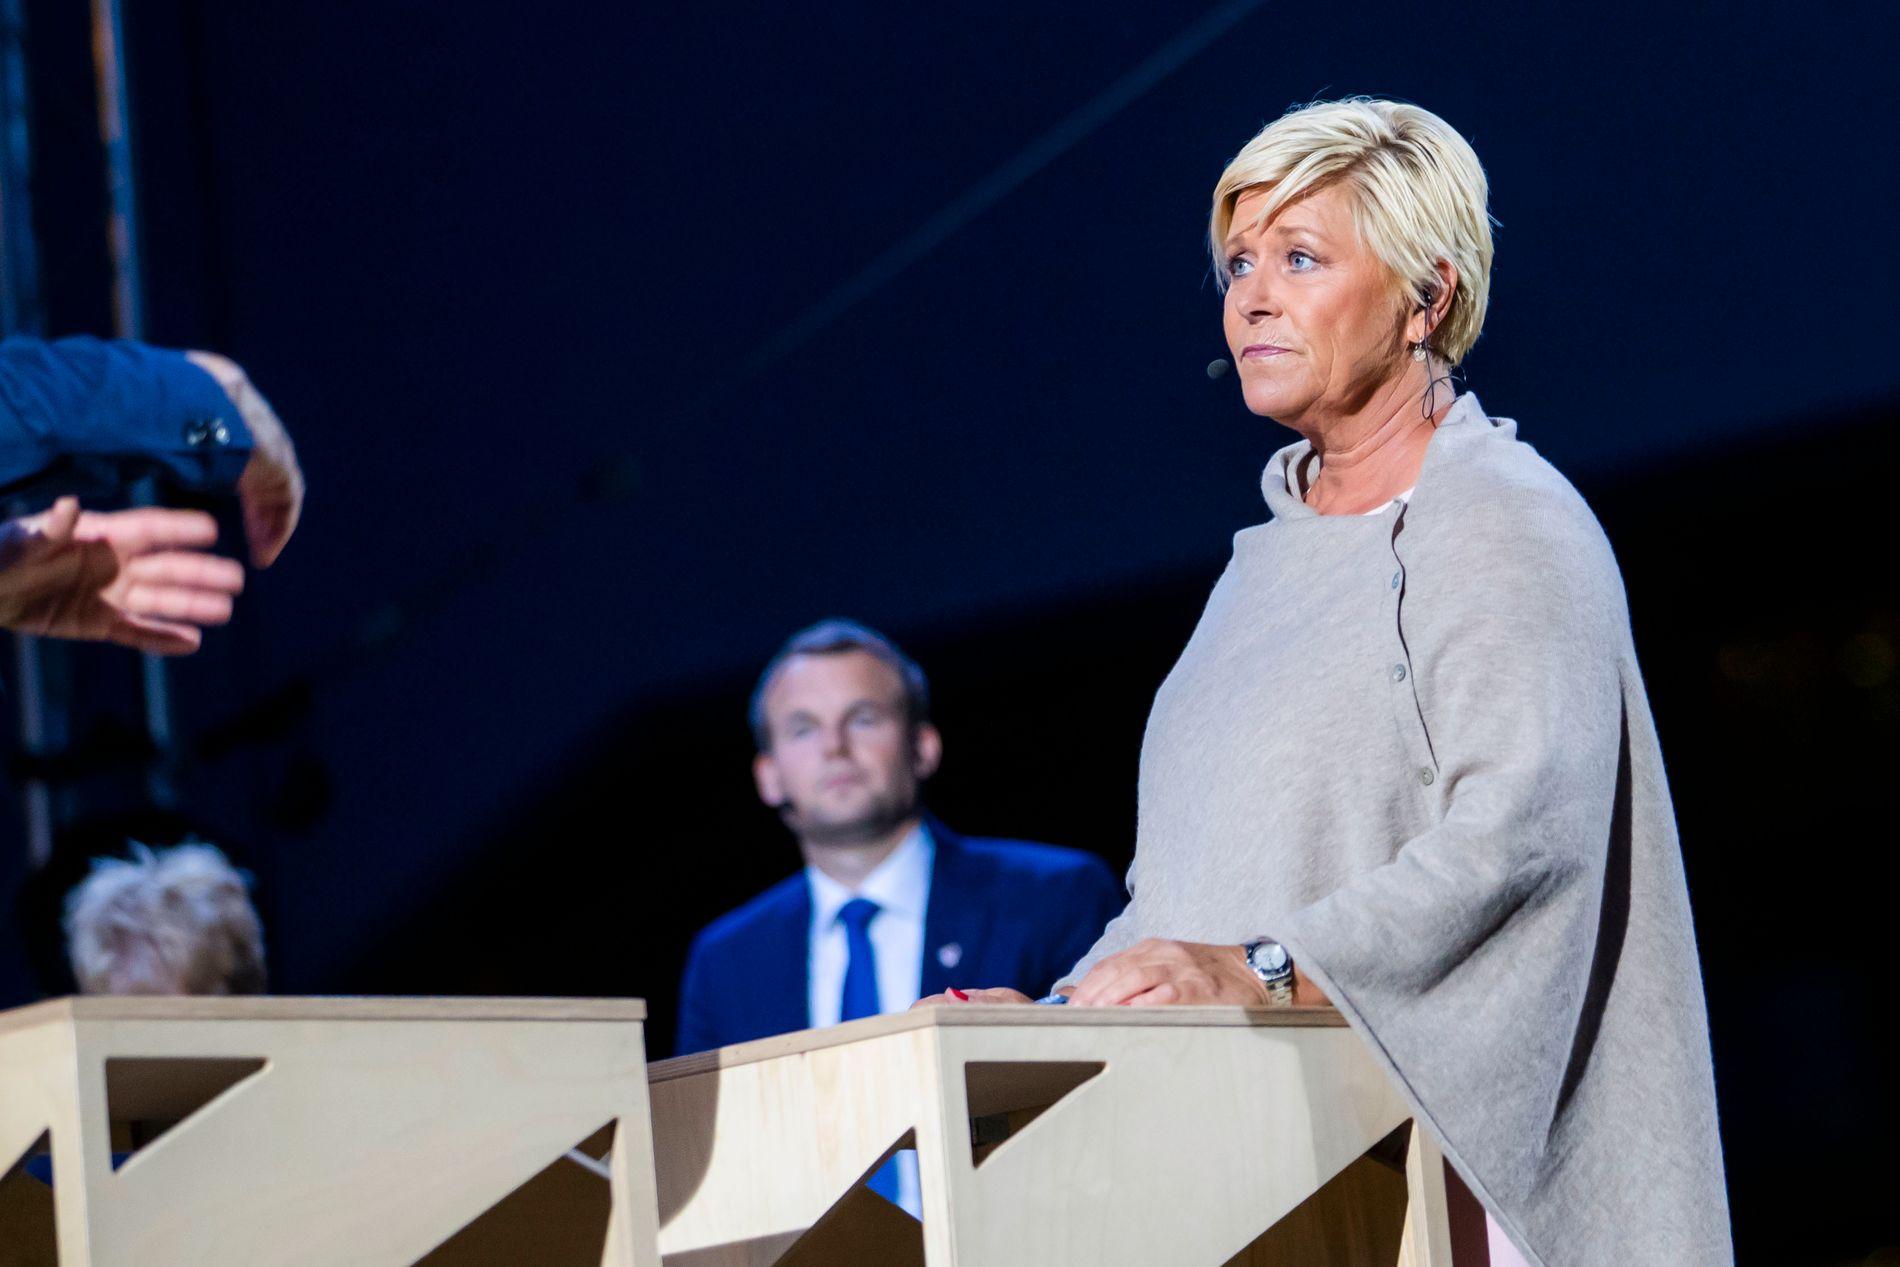 DEBATT: Leder i Fremskrittspartiet (Frp) Siv Jensen under den NRK-sendte partilederdebatten under Arendalsuka mandag kveld.